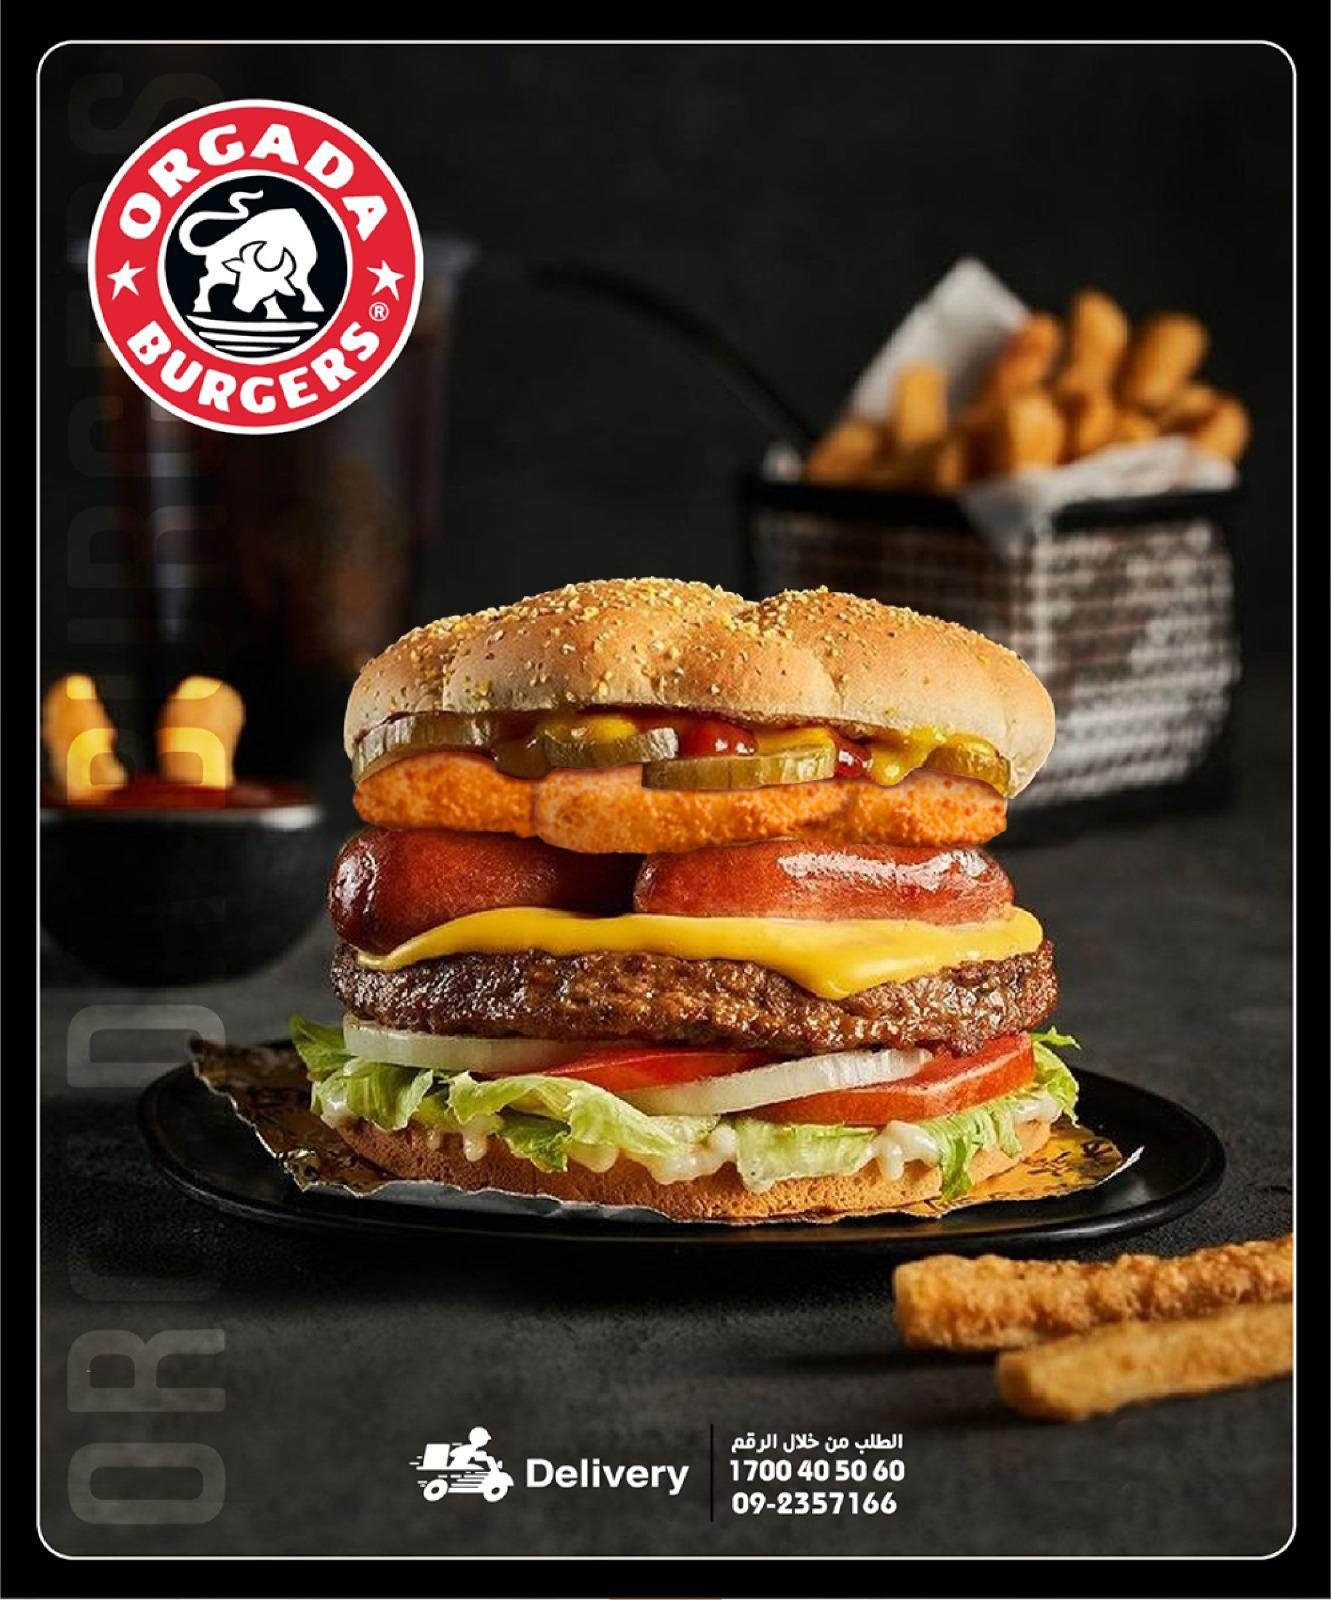 Hot-dog burger